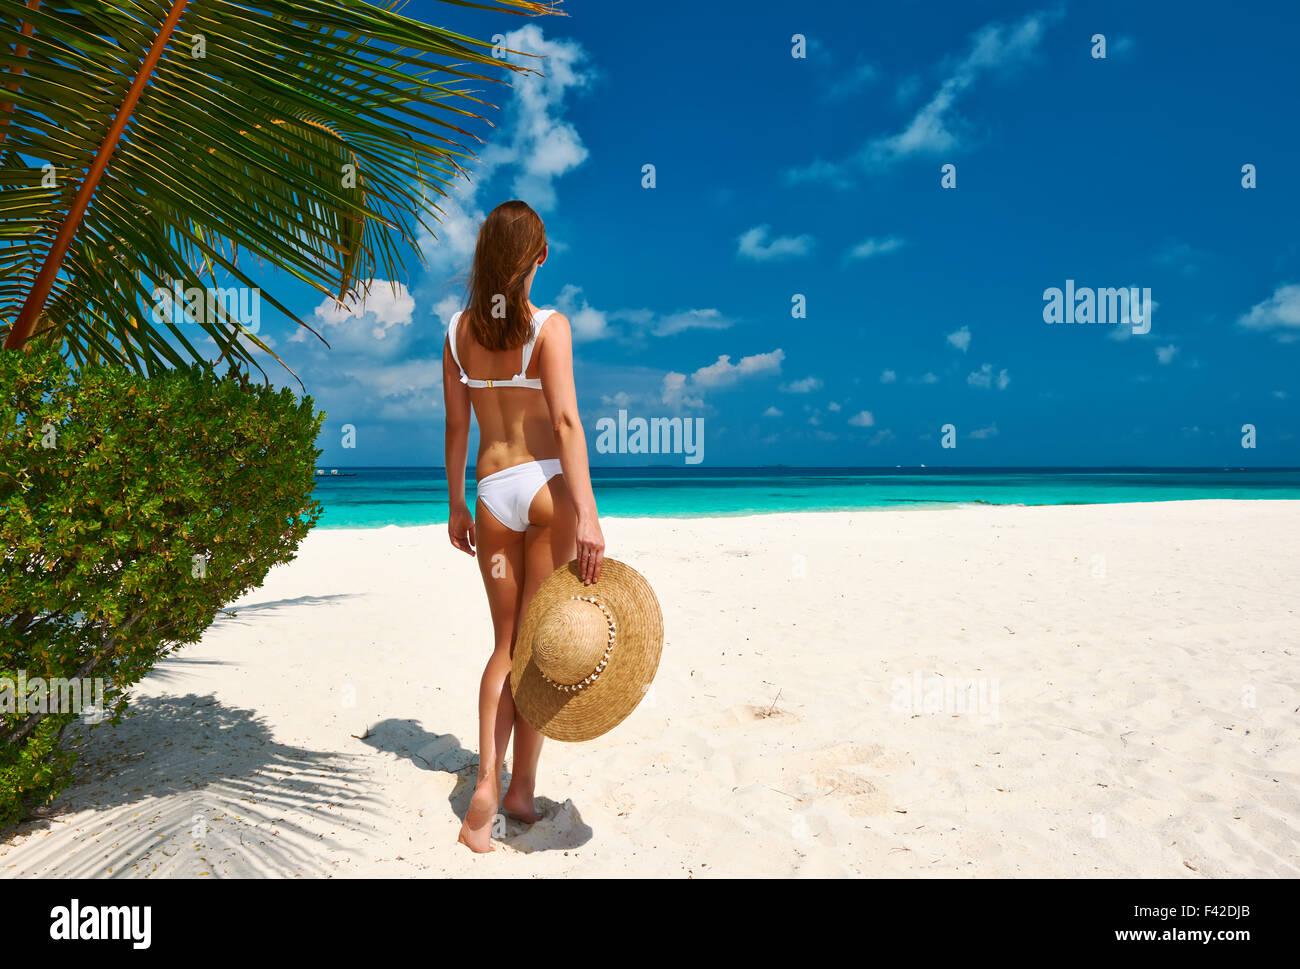 Woman in bikini on a beach at Maldives - Stock Image